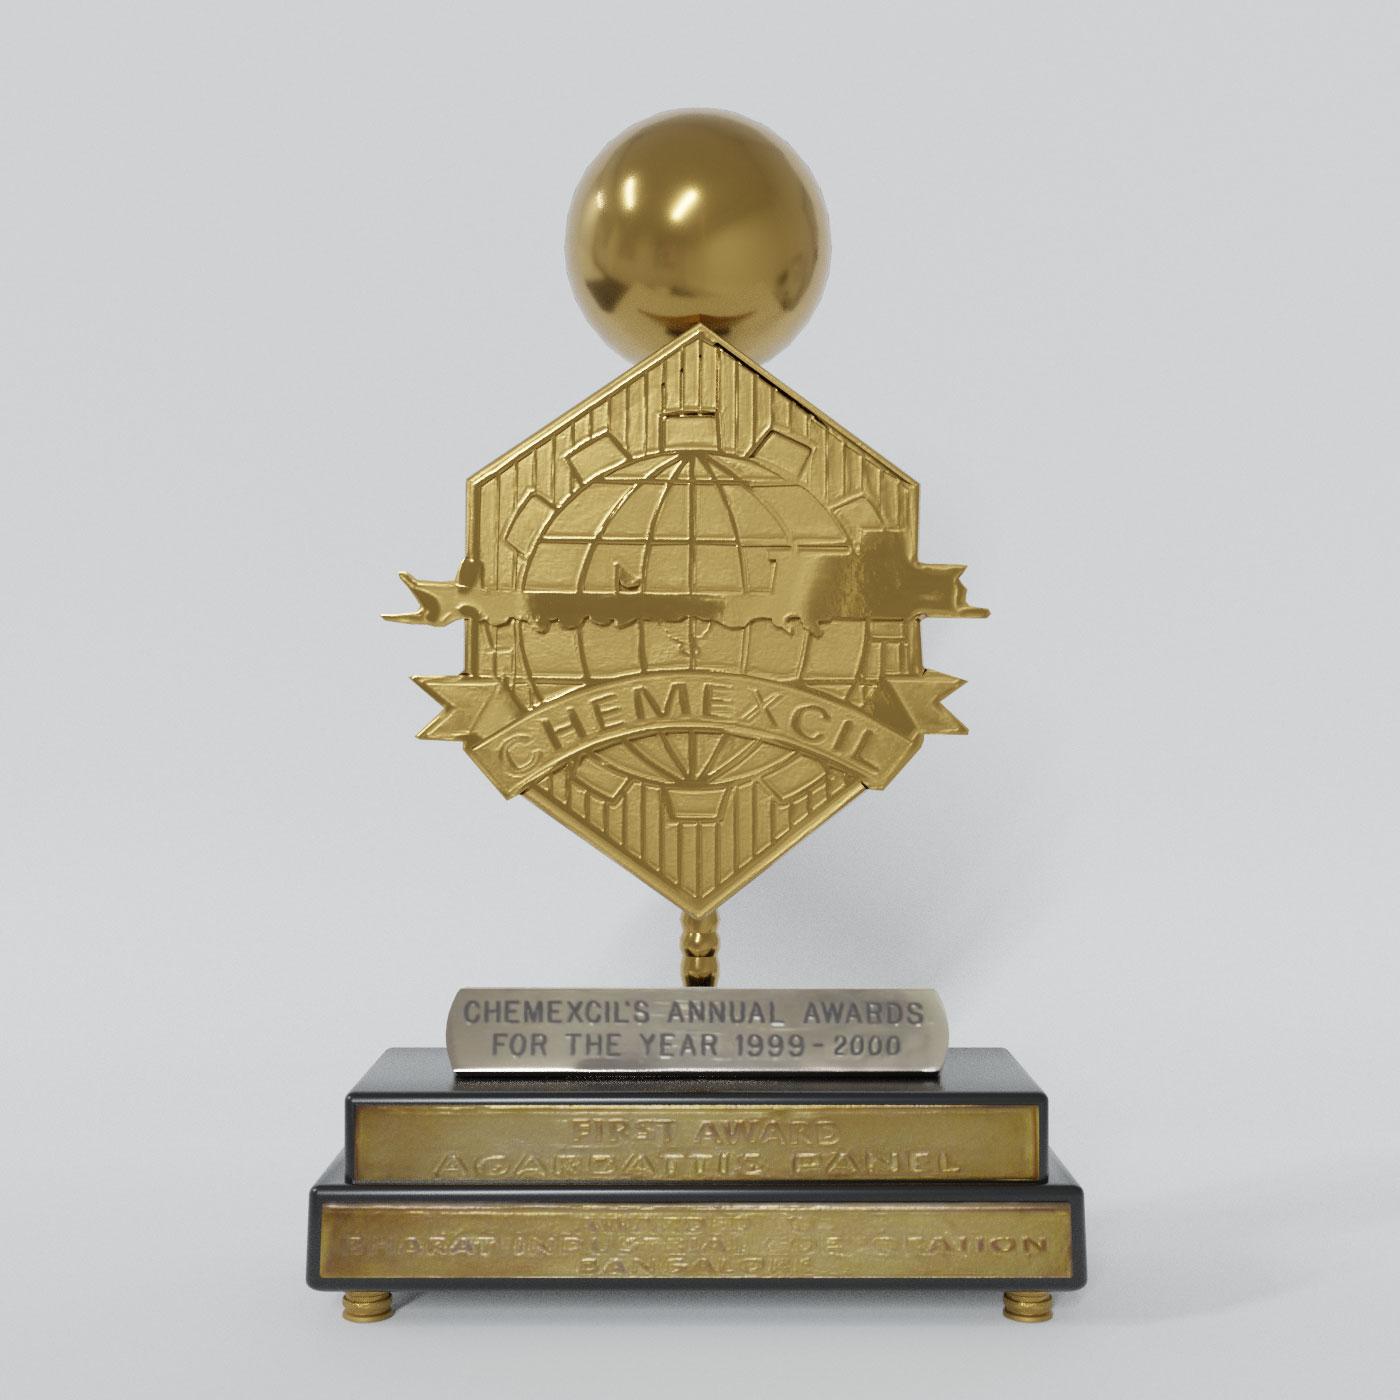 Chemexcil First Award Agarbattis Panel